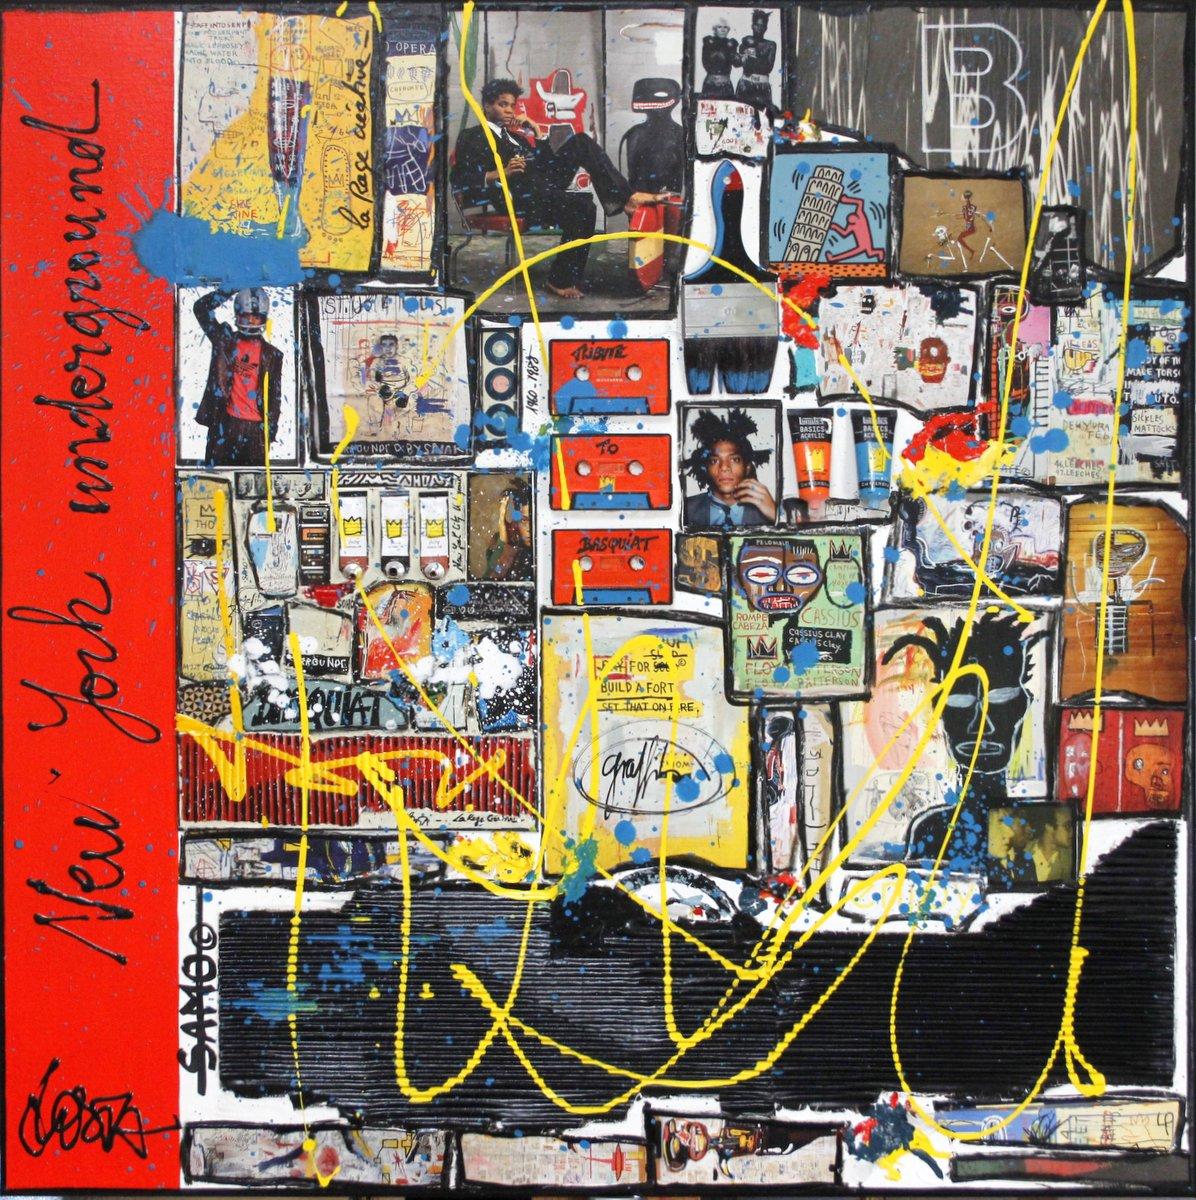 basquiat, collage Tableau Contemporain, Basquiat Inception. Sophie Costa, artiste peintre.